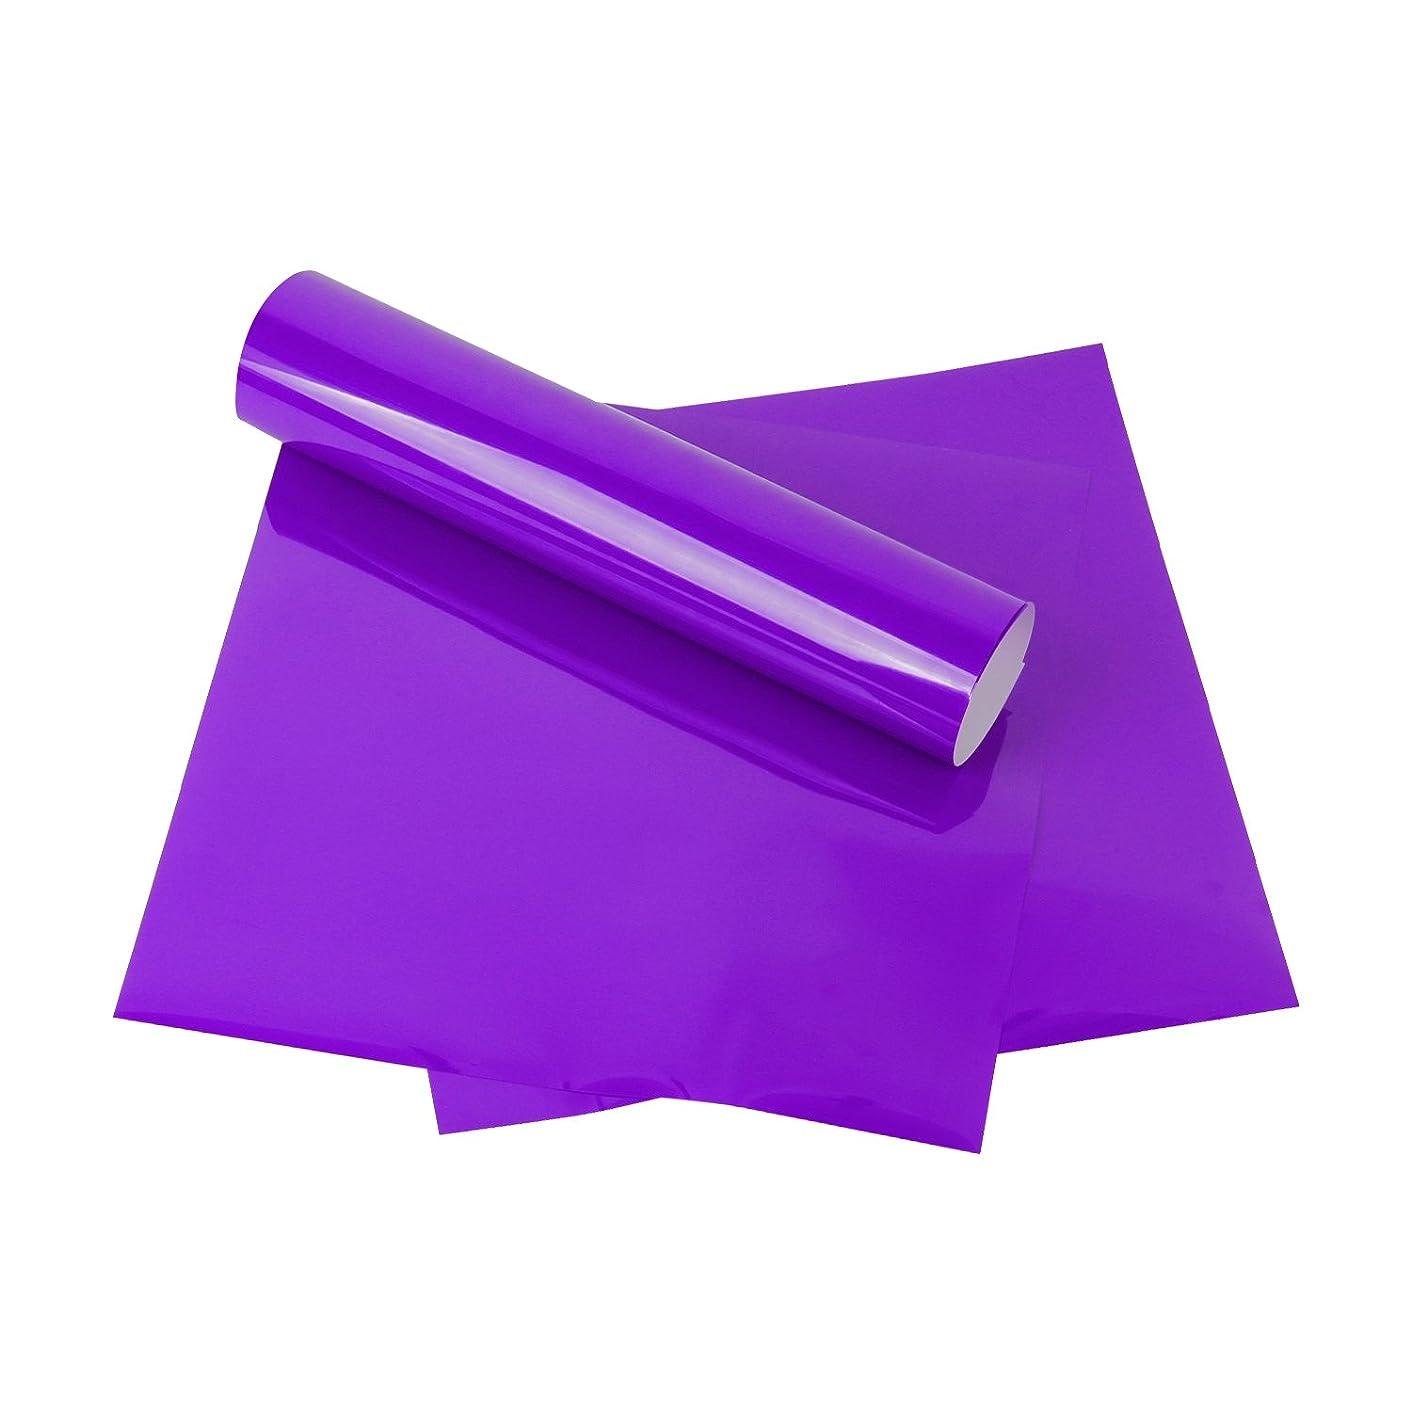 RUSPEPA Heat Transfer Vinyl HTV - Iron On for Silhouette Cameo & Cricut - HTV for Fabrics and Hats - 12x12Inch - 3sheet - Purple